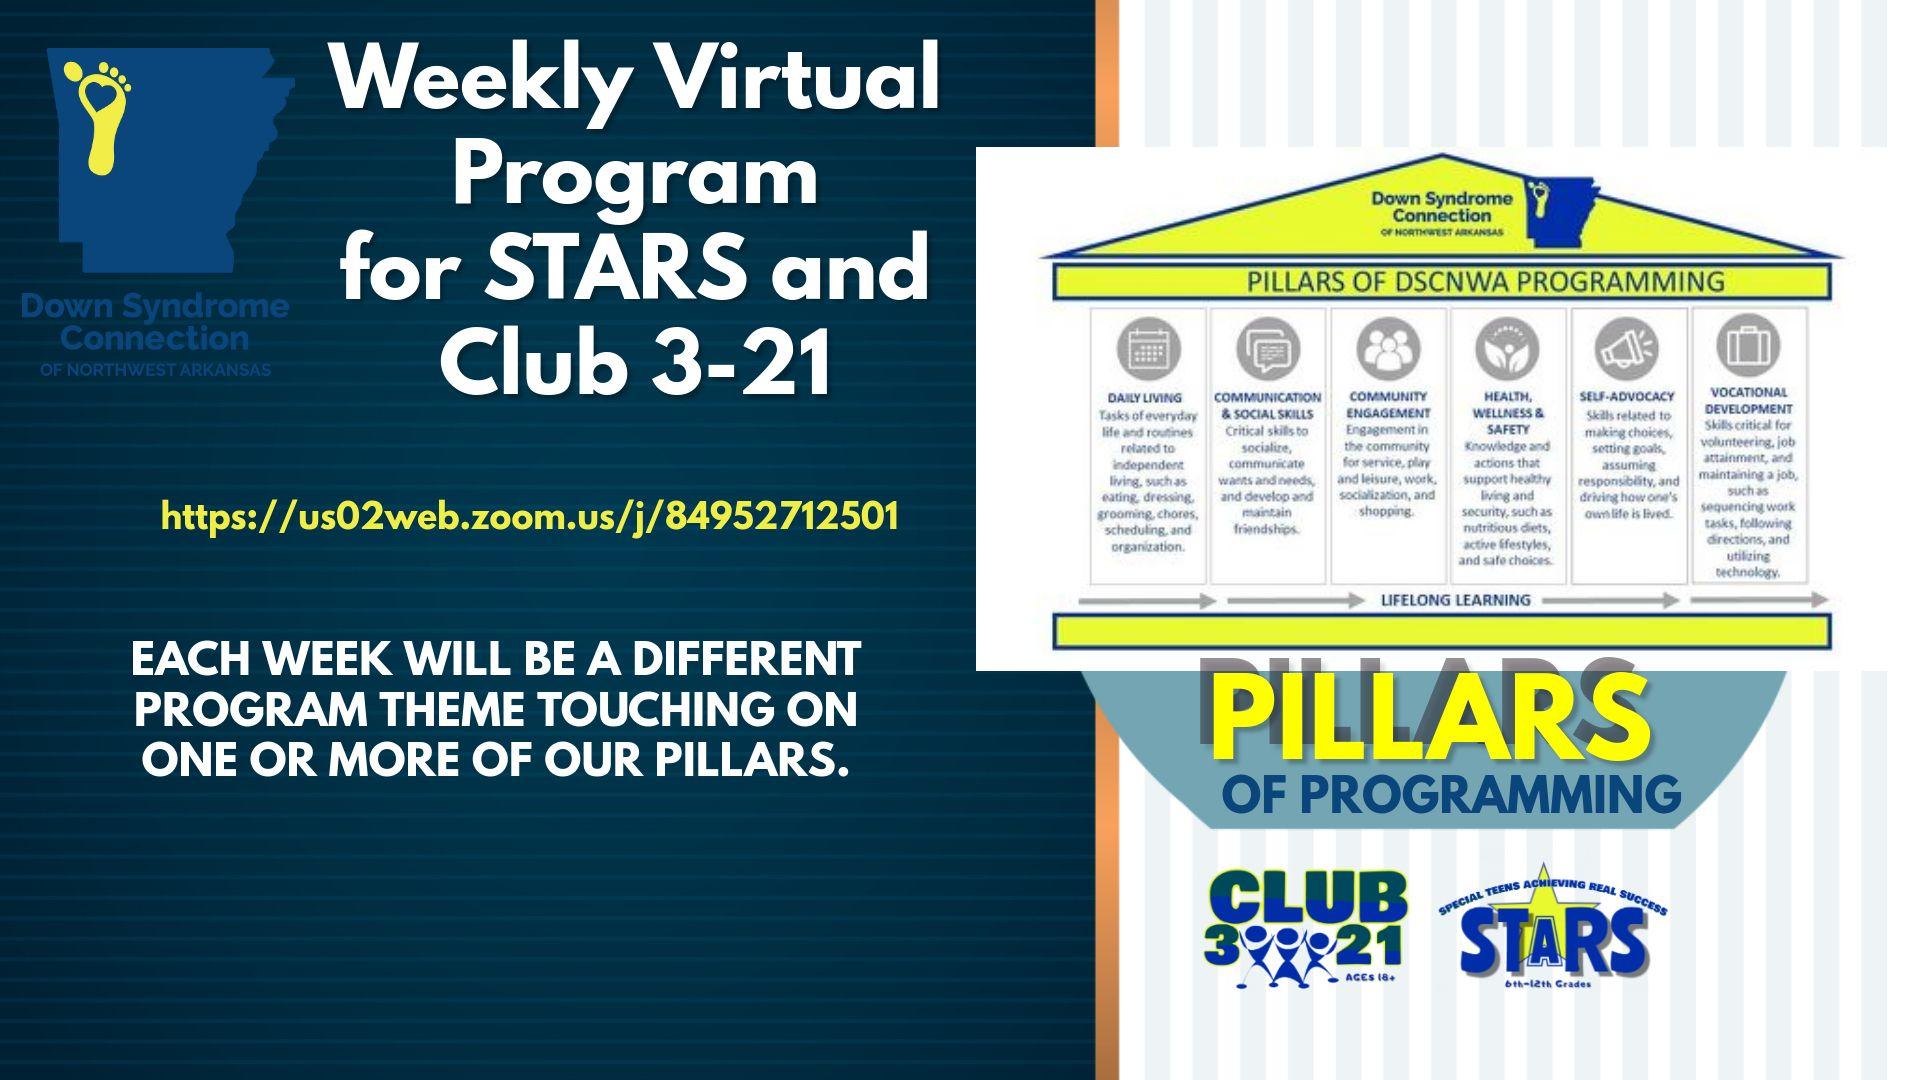 DSCNWA Weekly Virtual Program for STARS and Club 3-21